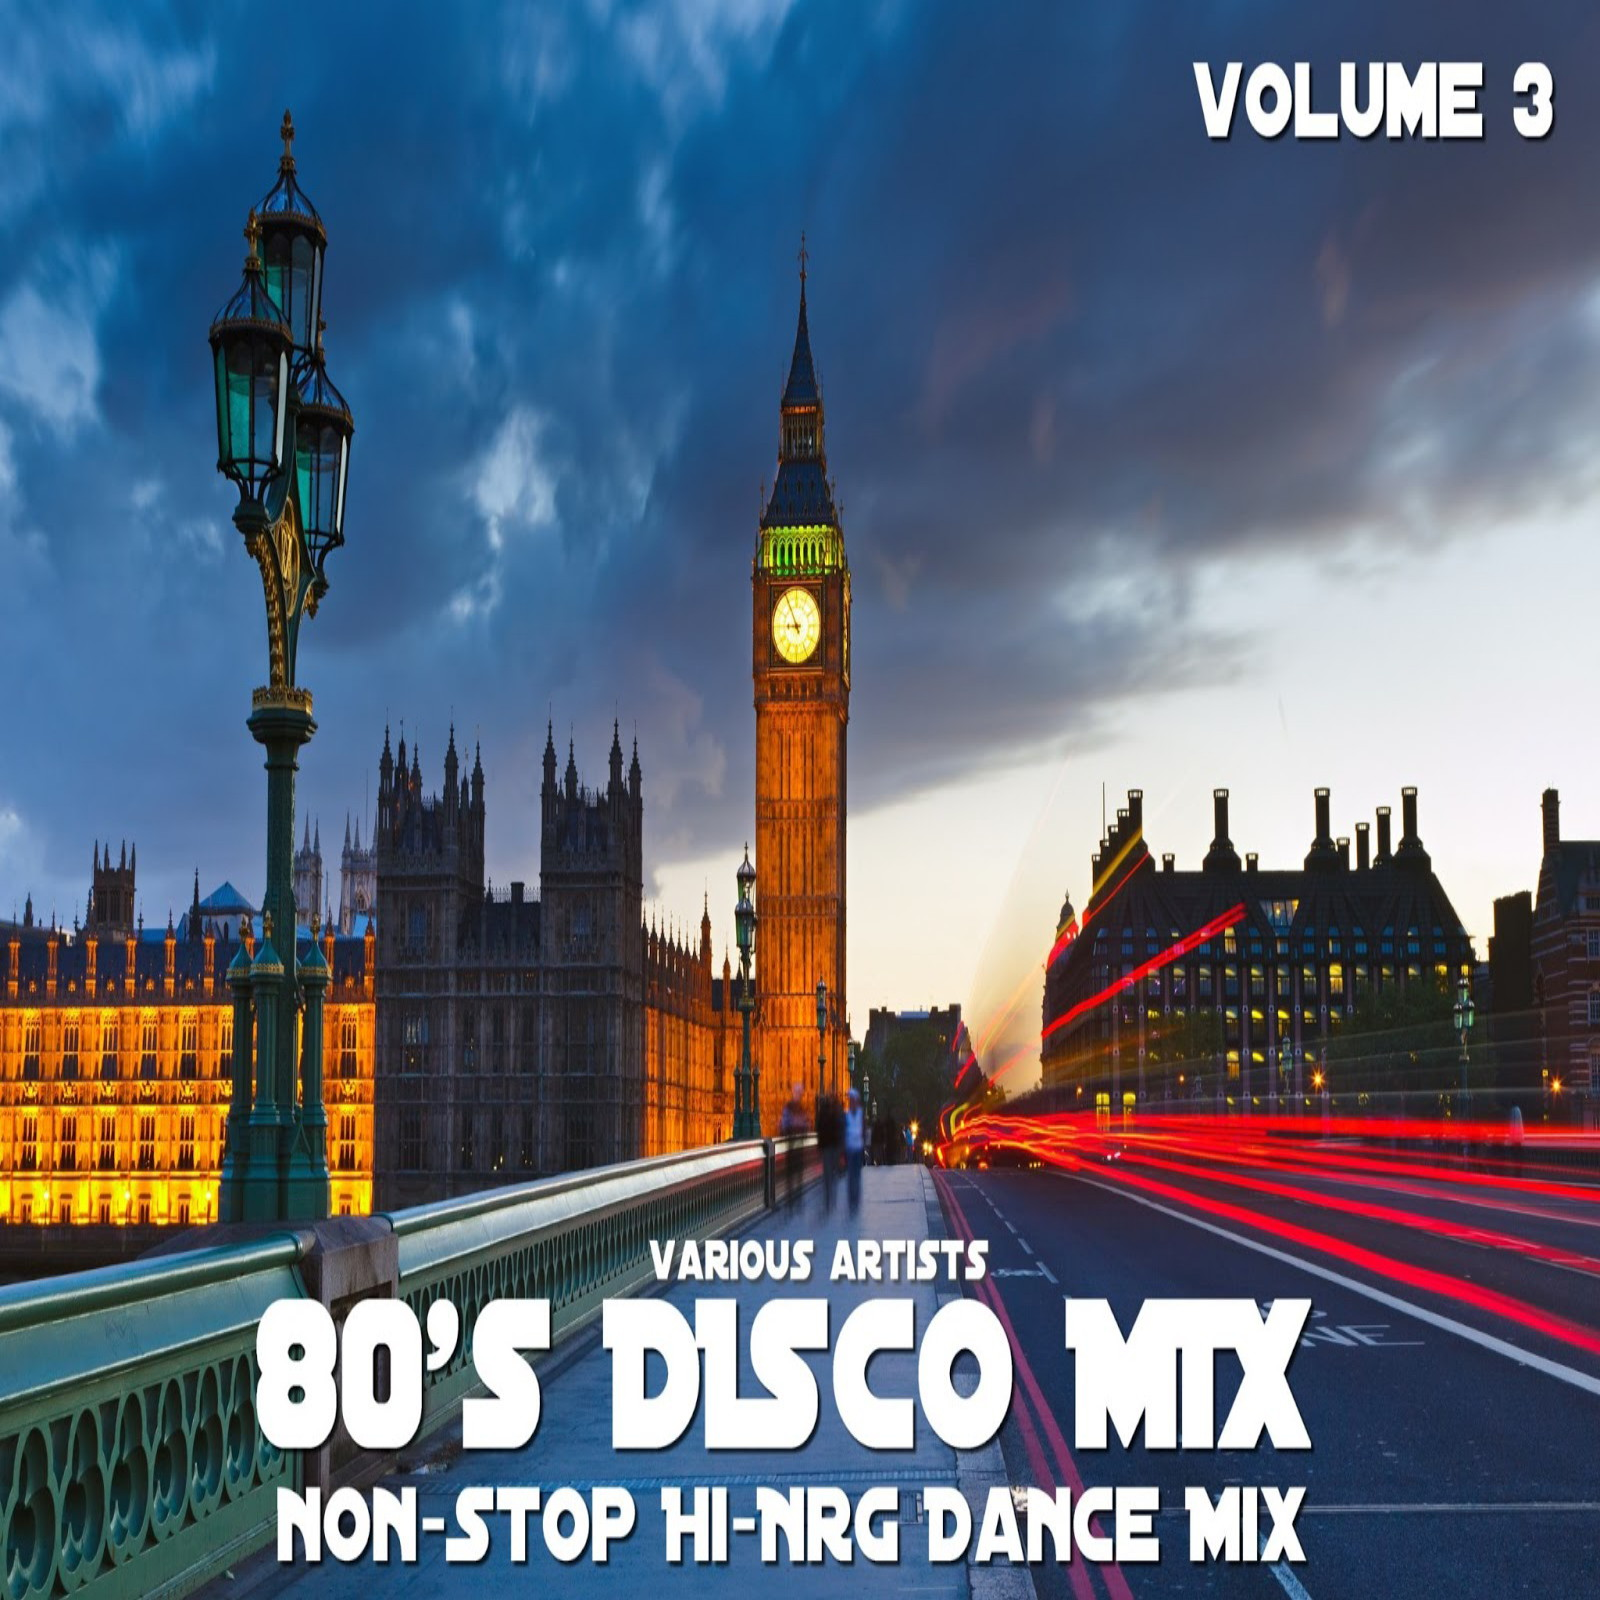 RETRO DISCO HI-NRG: 80s DISCO MIX - VOLUME 3 (Non-Stop Hi